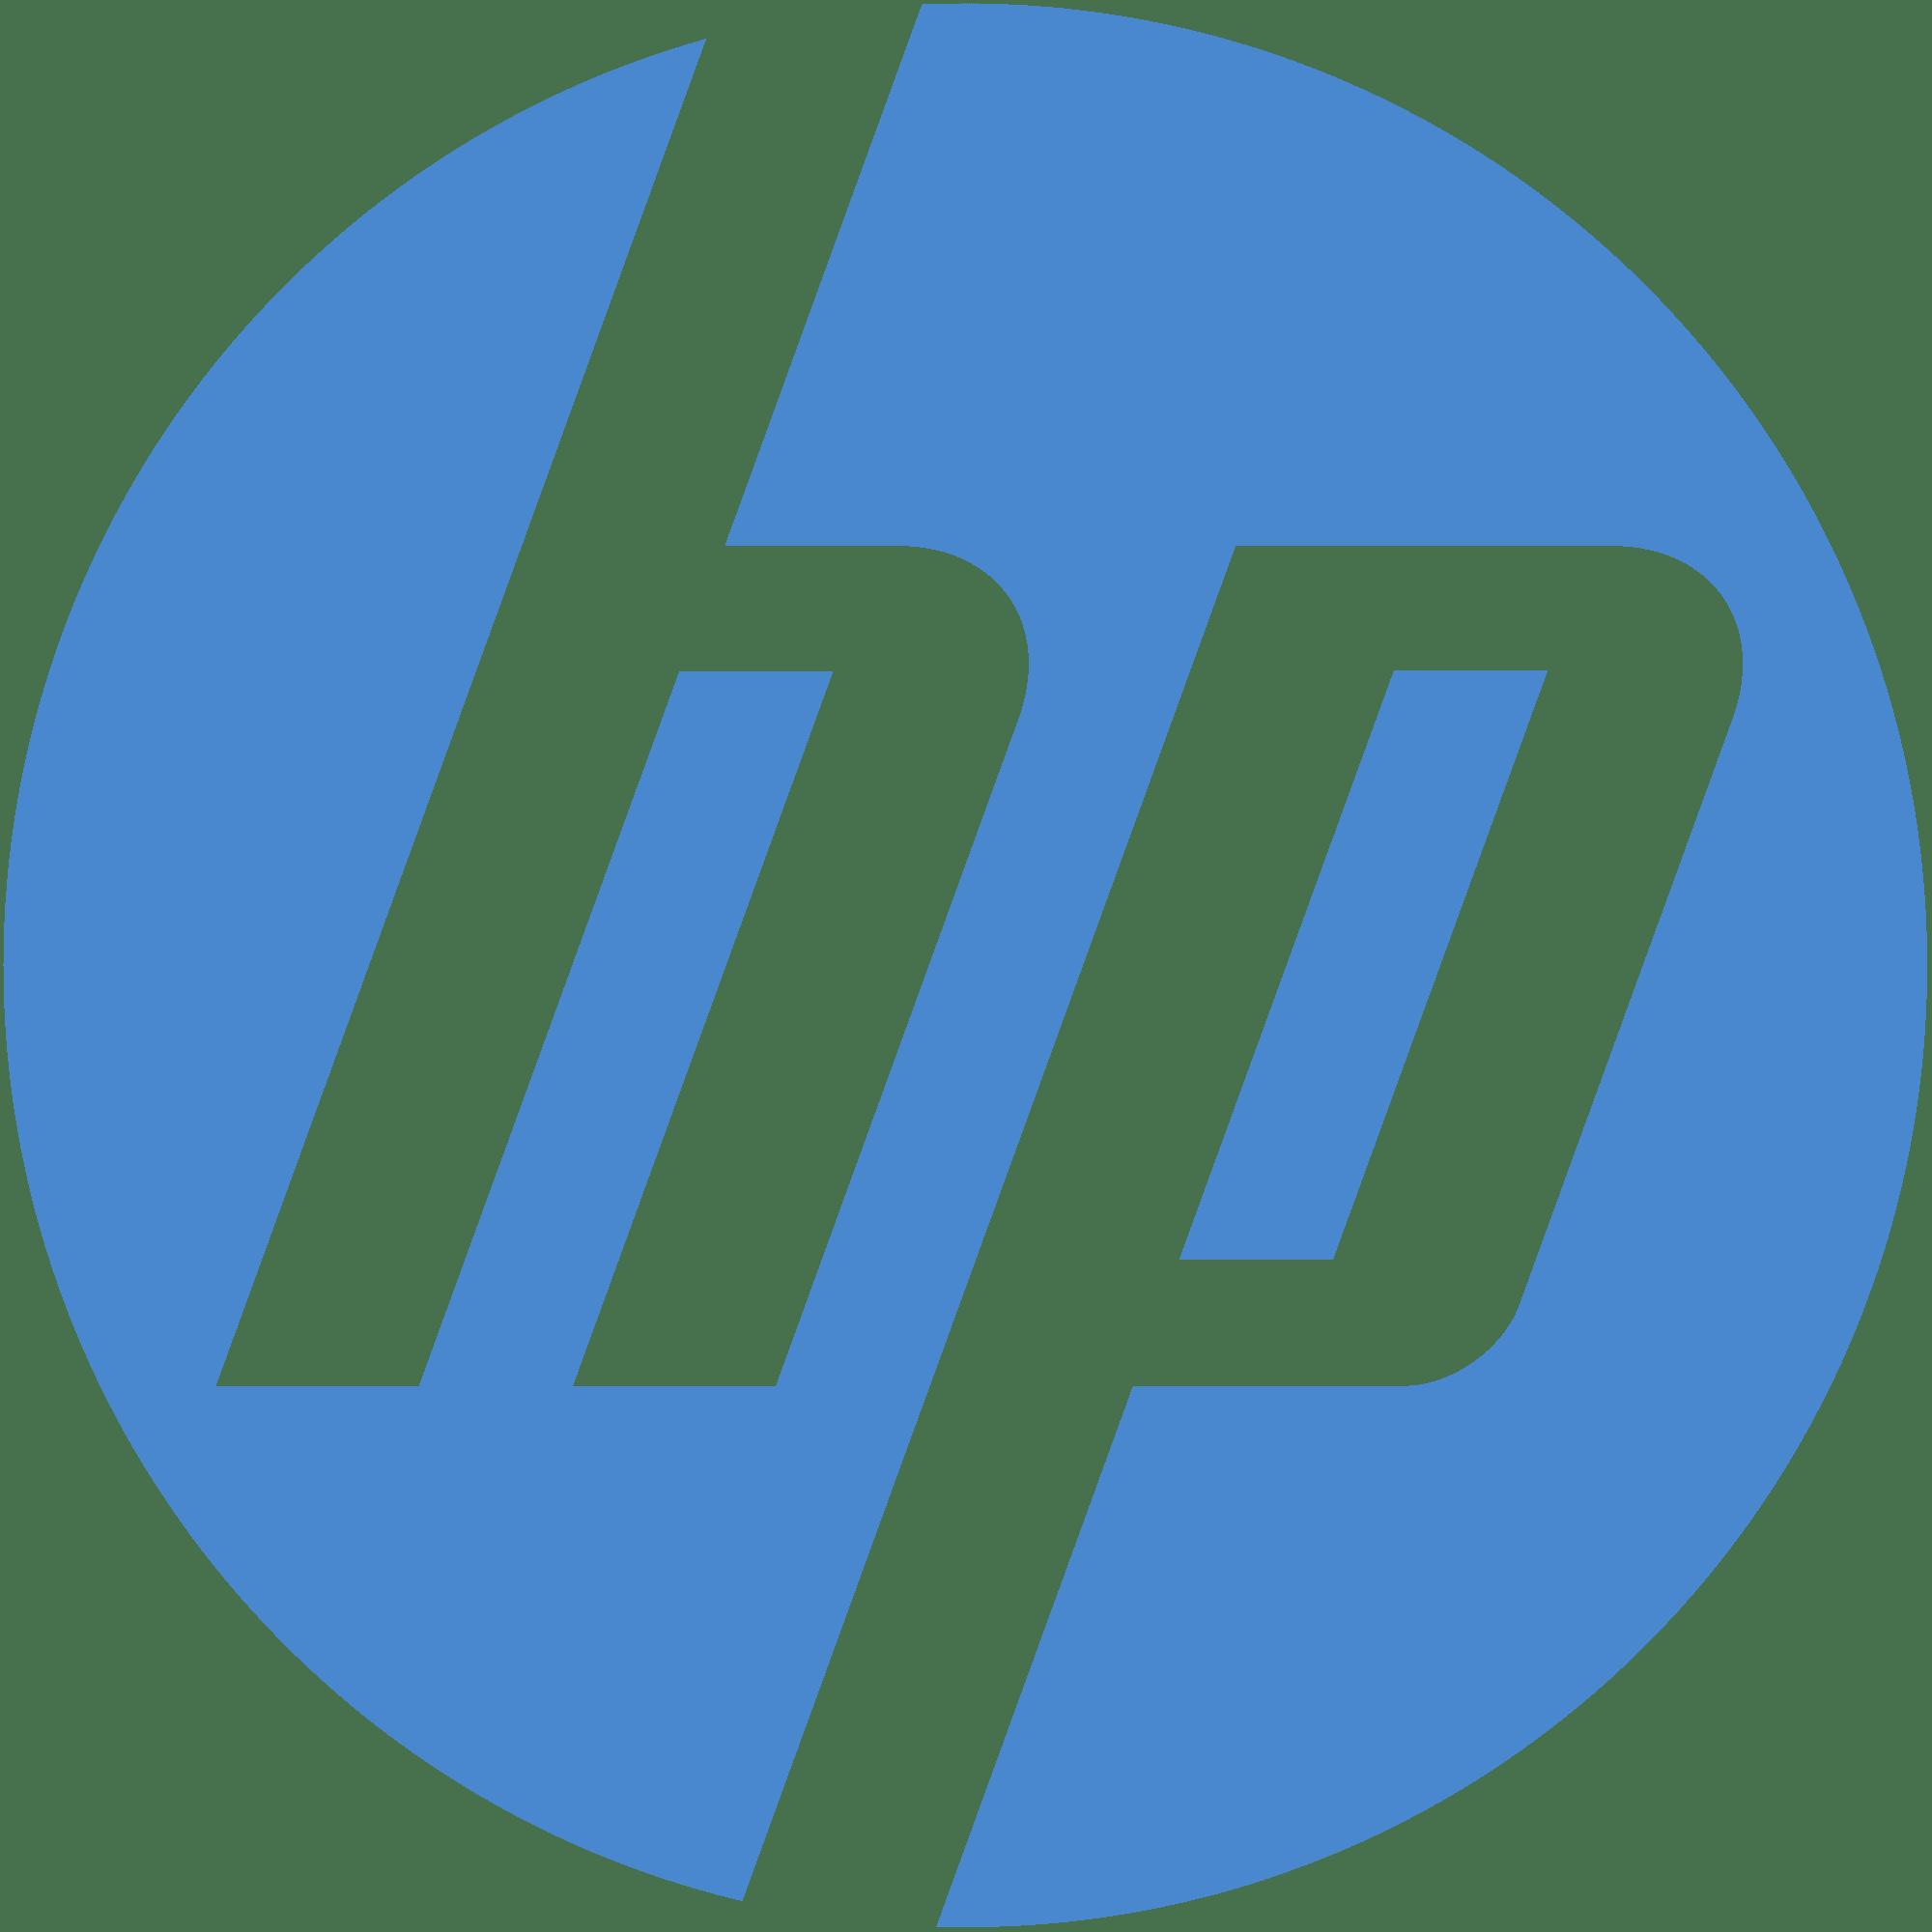 HP LaserJet 6p/mp Printer series drivers